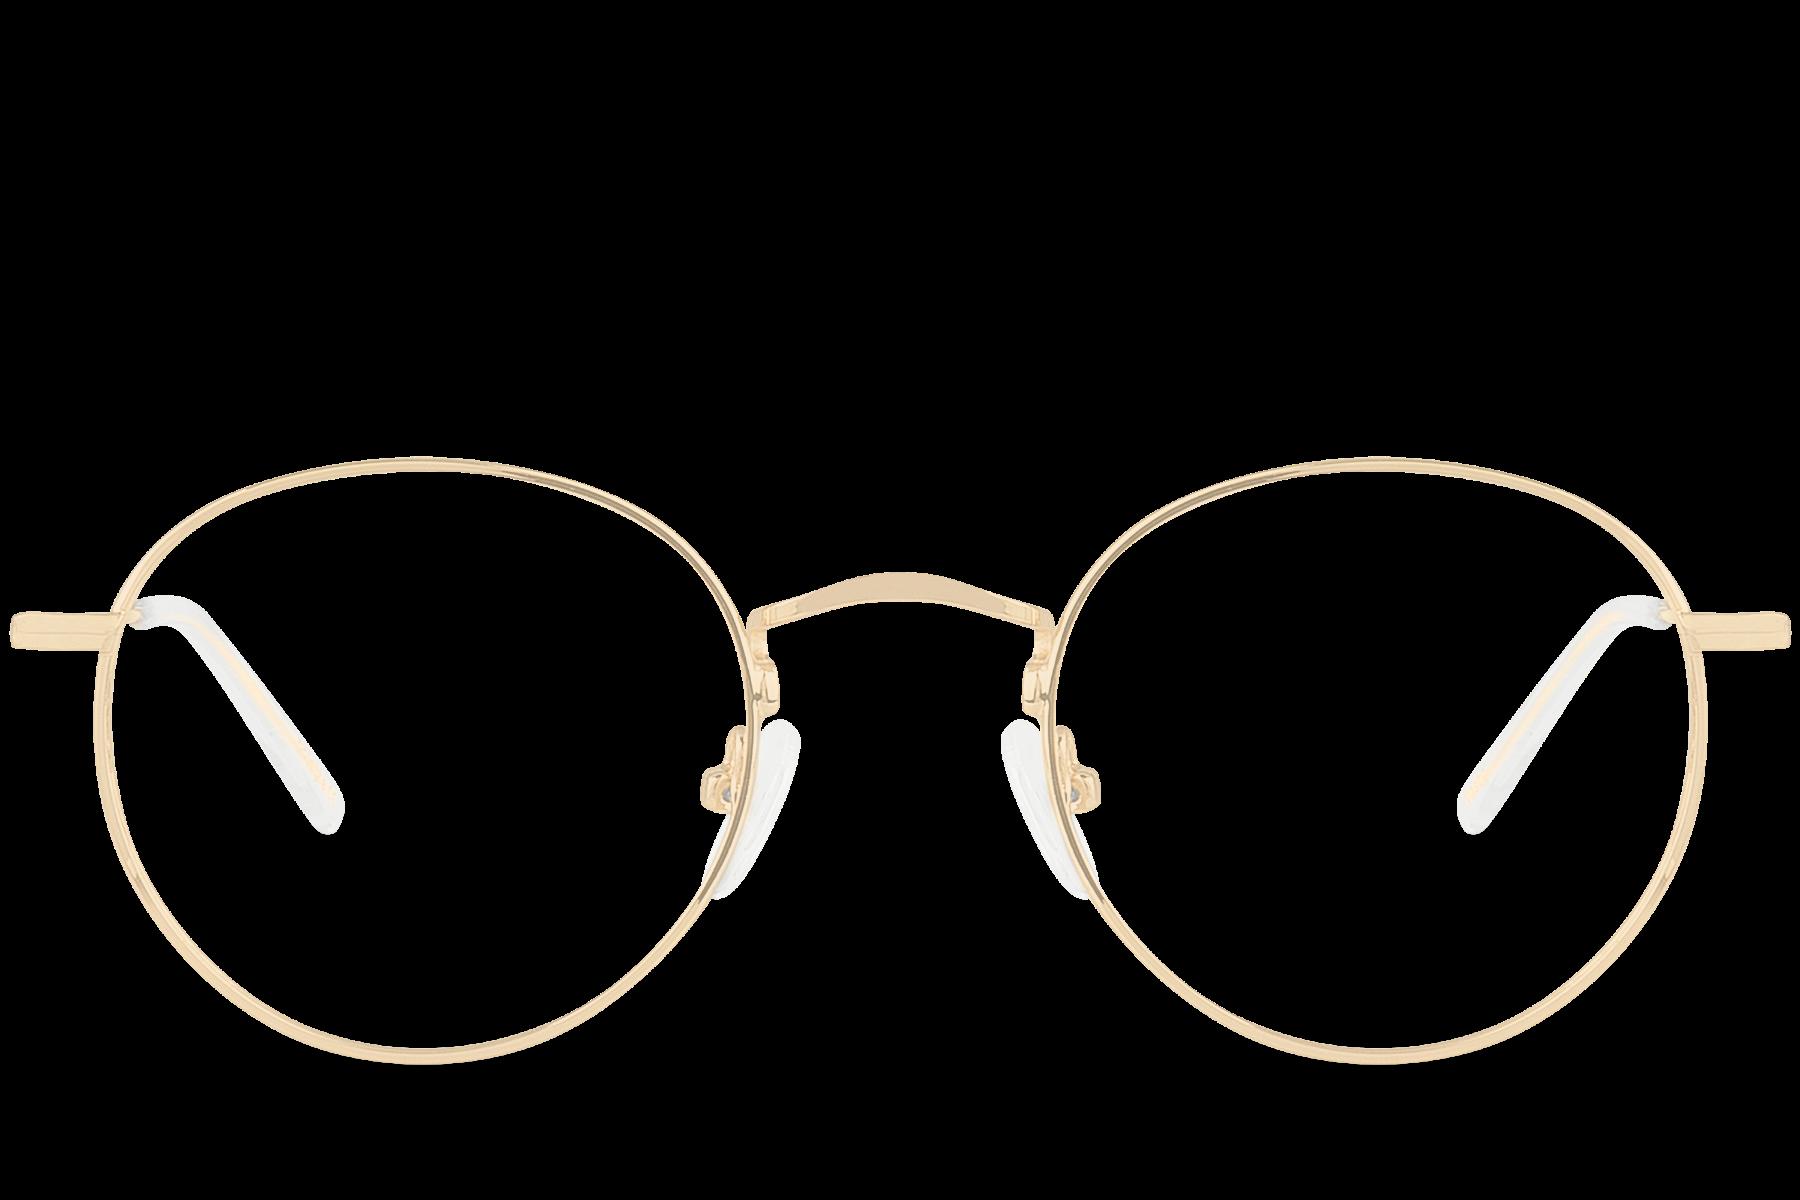 Télécharger photo gold glasses png